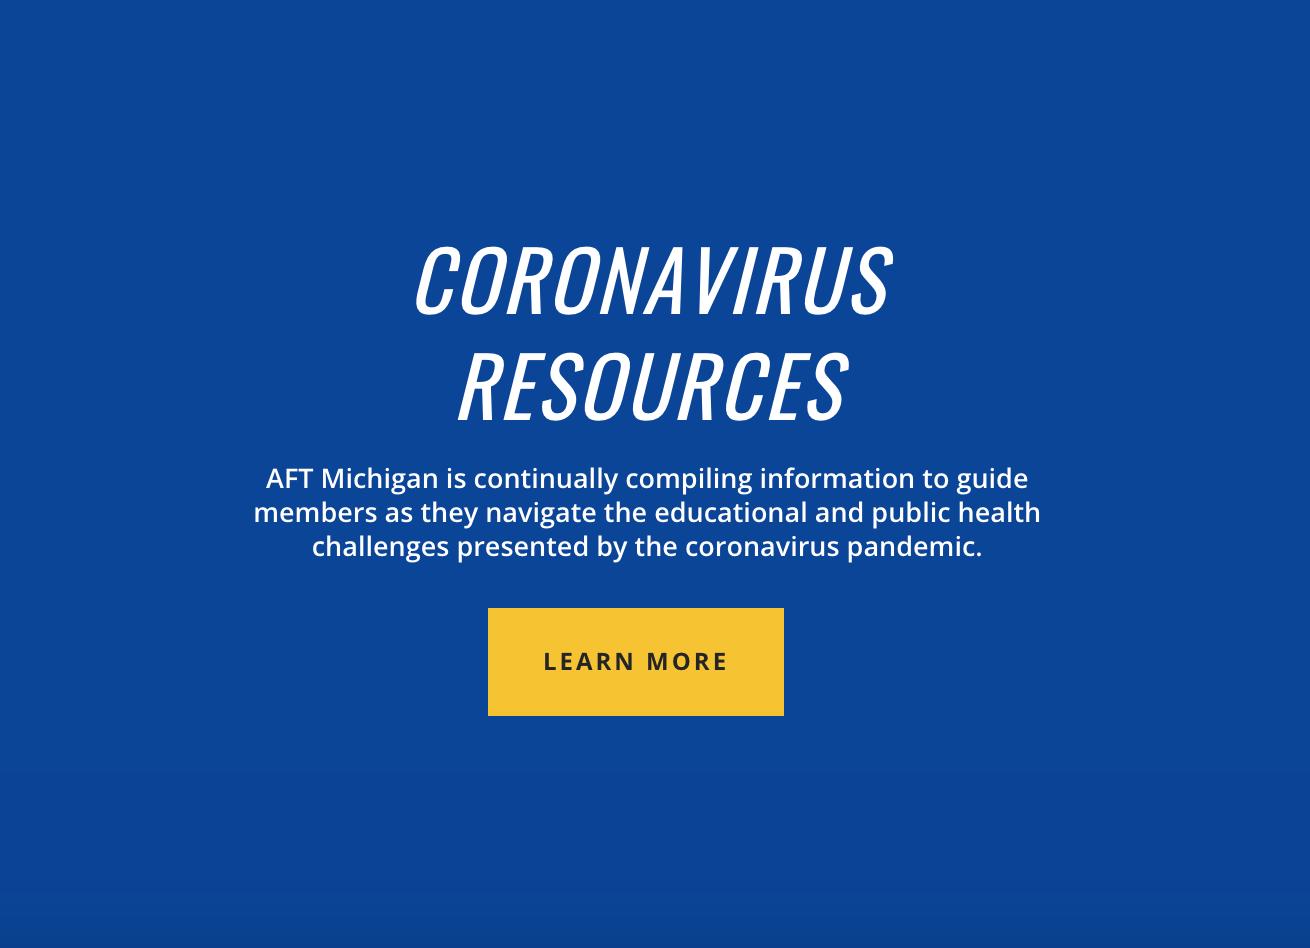 AFT Michigan Coronavirus Updates and Information - AFT Michigan